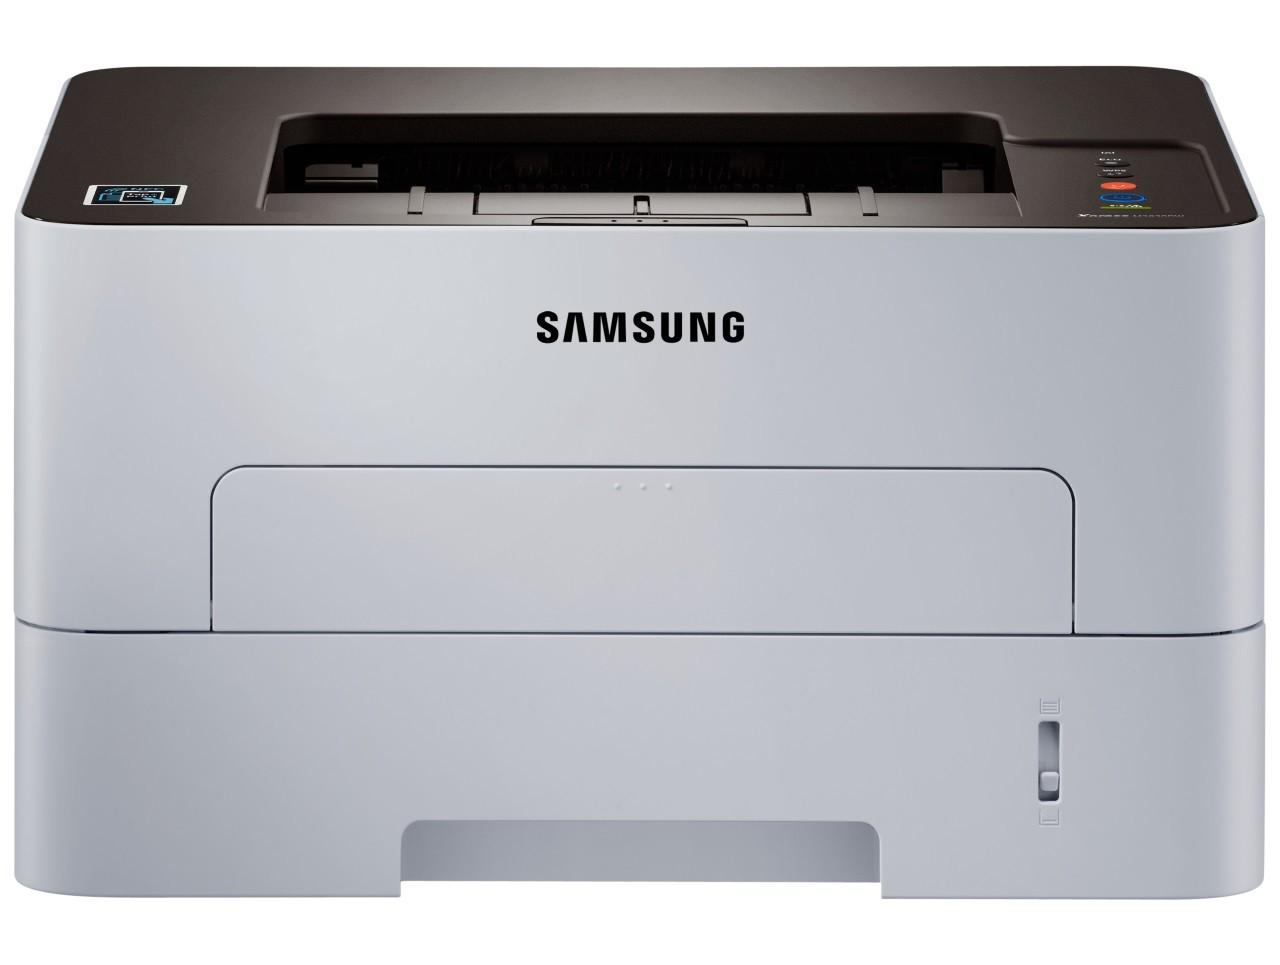 Samsung Airprint Laser Printer 55 Shipped Orig 160